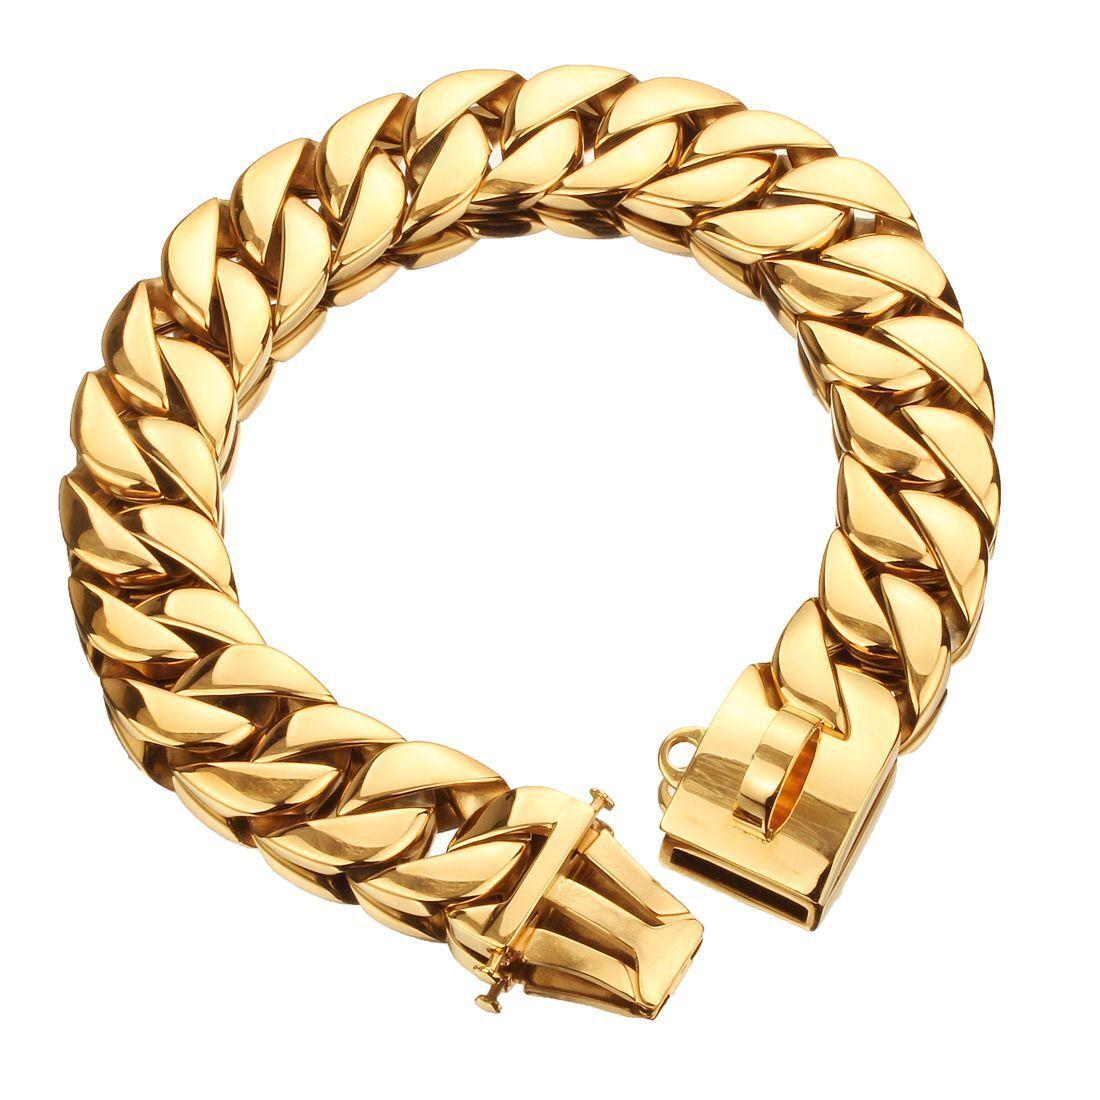 Large Dog Collar Collar Gold Chain 32mm 316 Stainless Steel Bulldog Pitbull Collar Leash Pet Trainning Dog Collar LeadNecklace